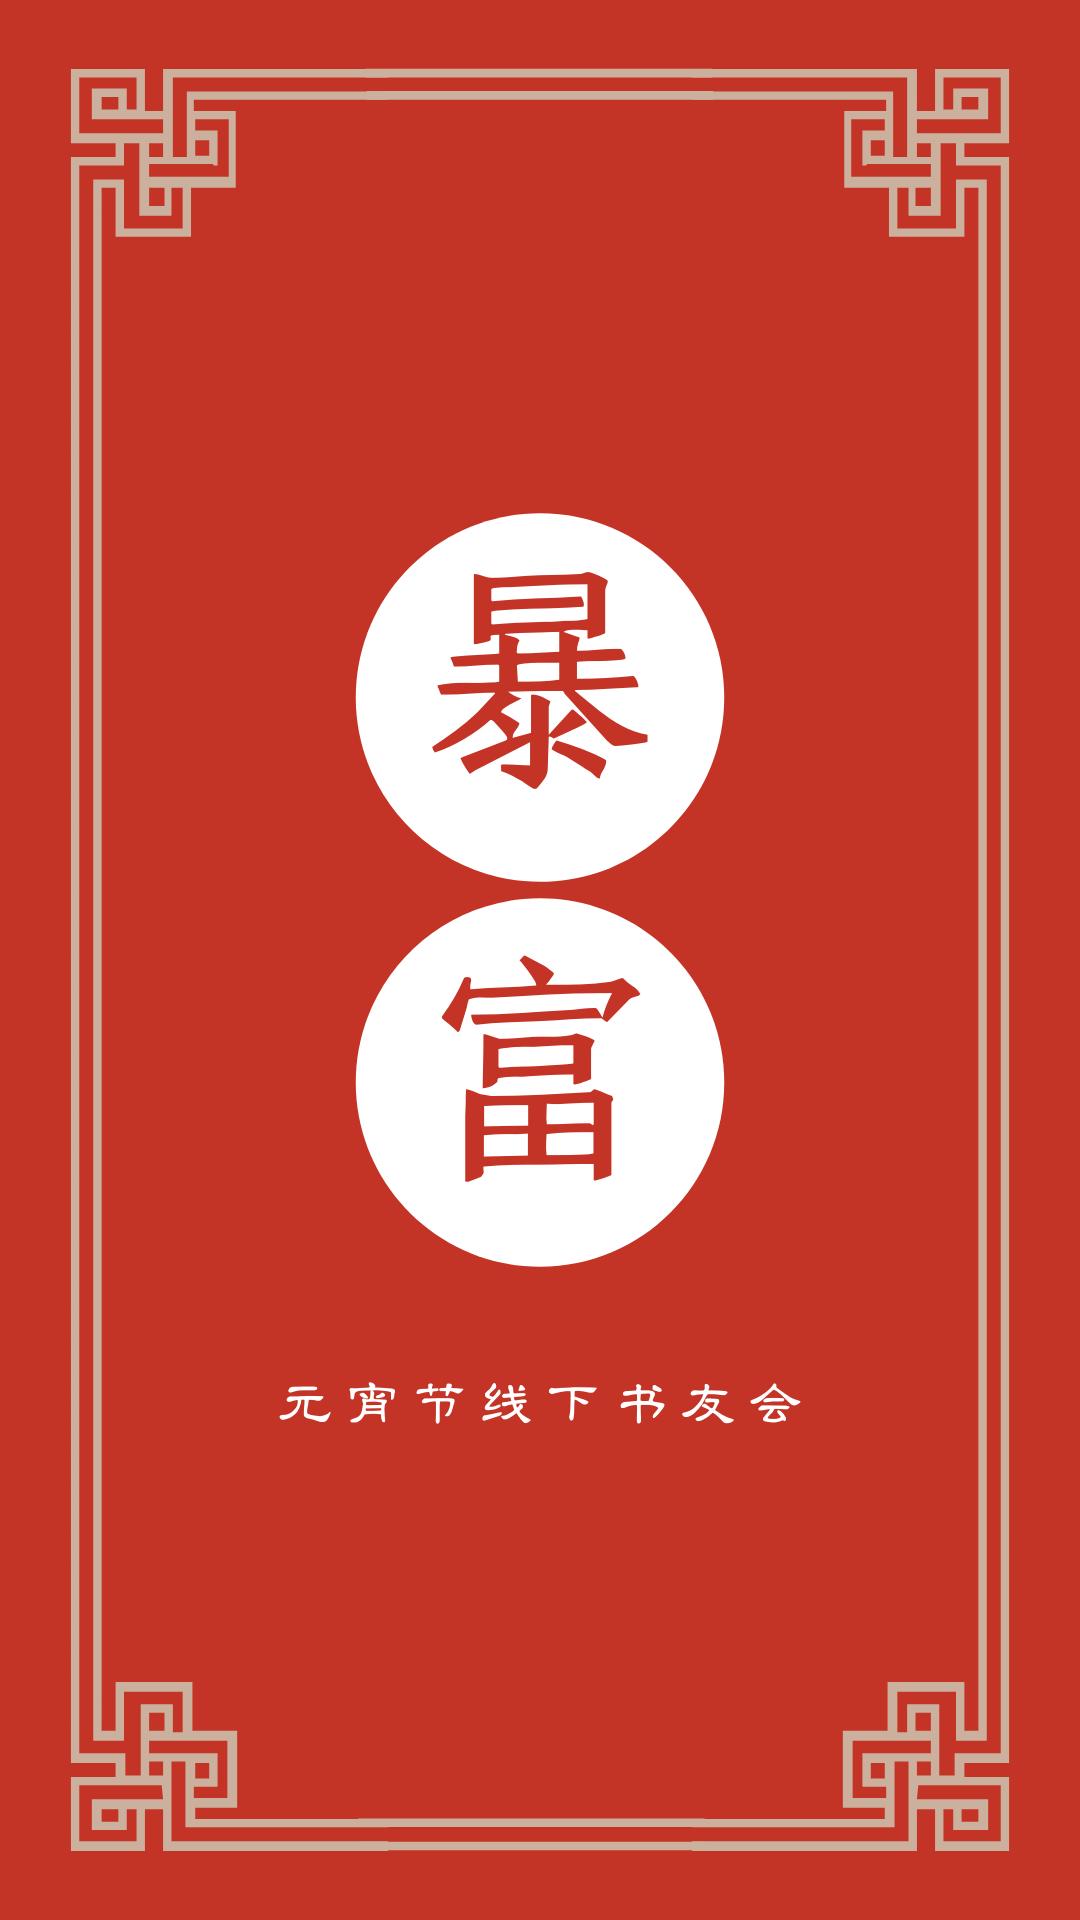 http://www.huodongxing.com/file/20180910/4573174390560/274066723362012.png